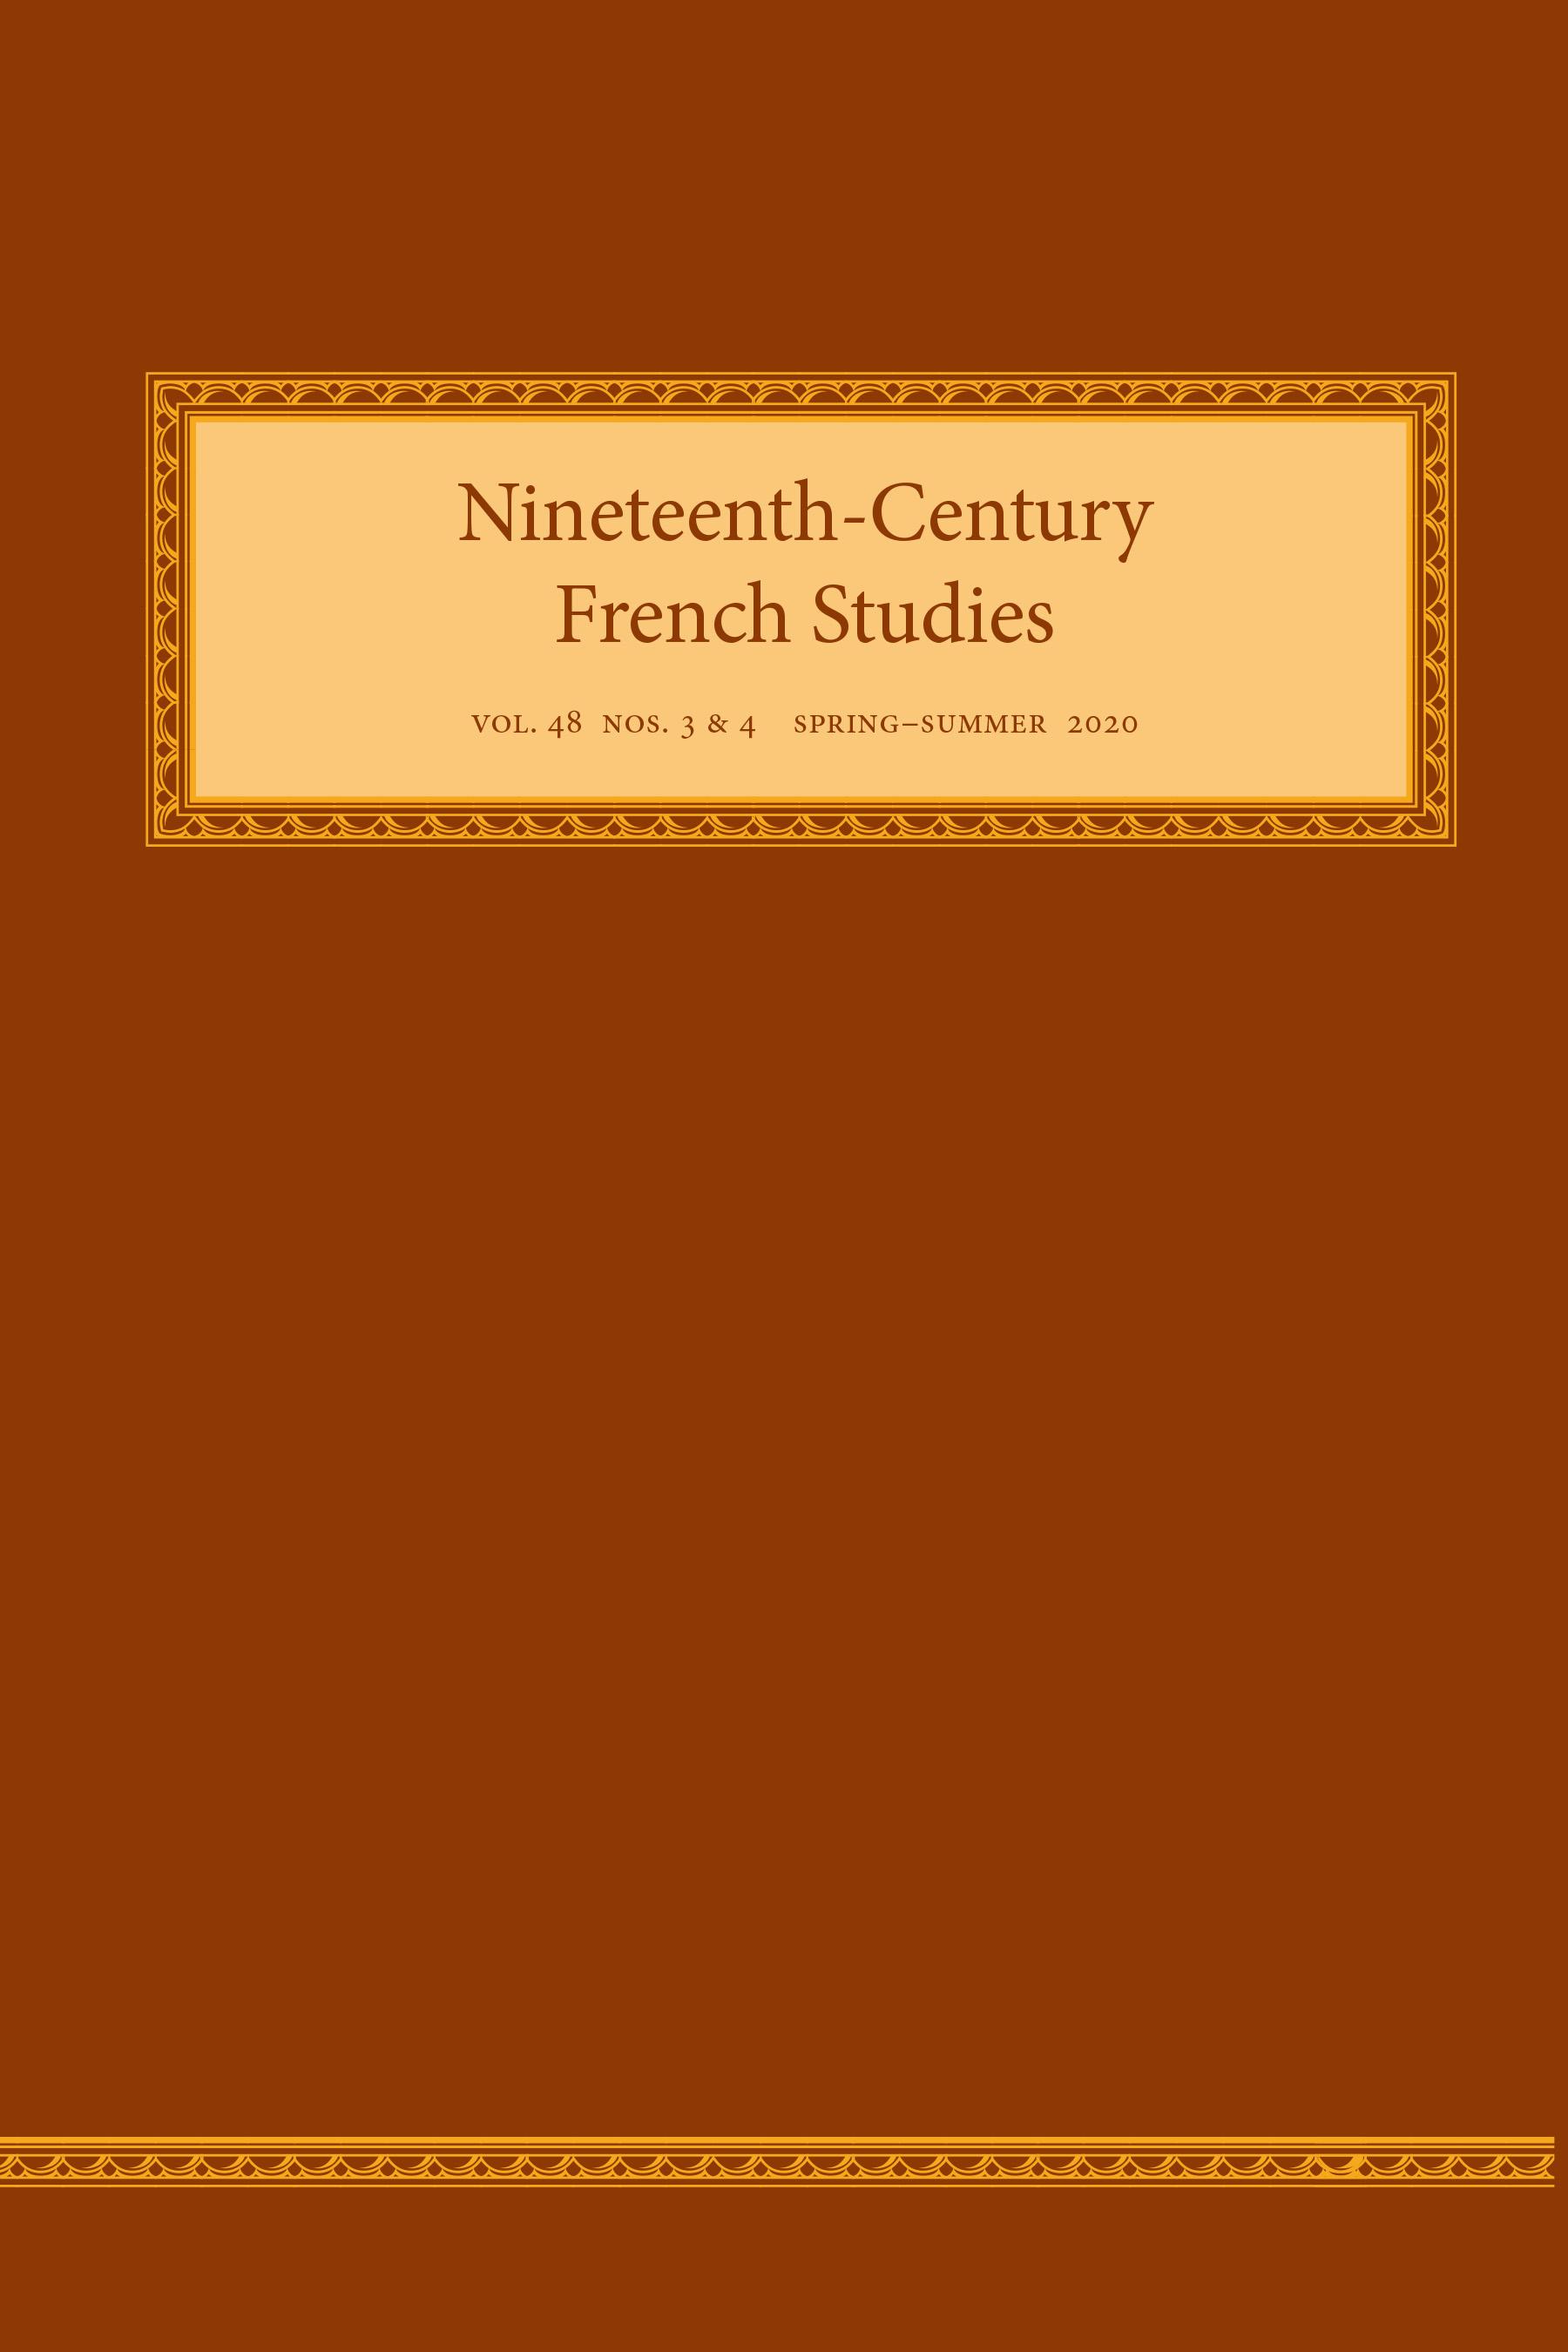 Nineteenth-Century French Studies, vol. 48, n° 3-4 (2020)